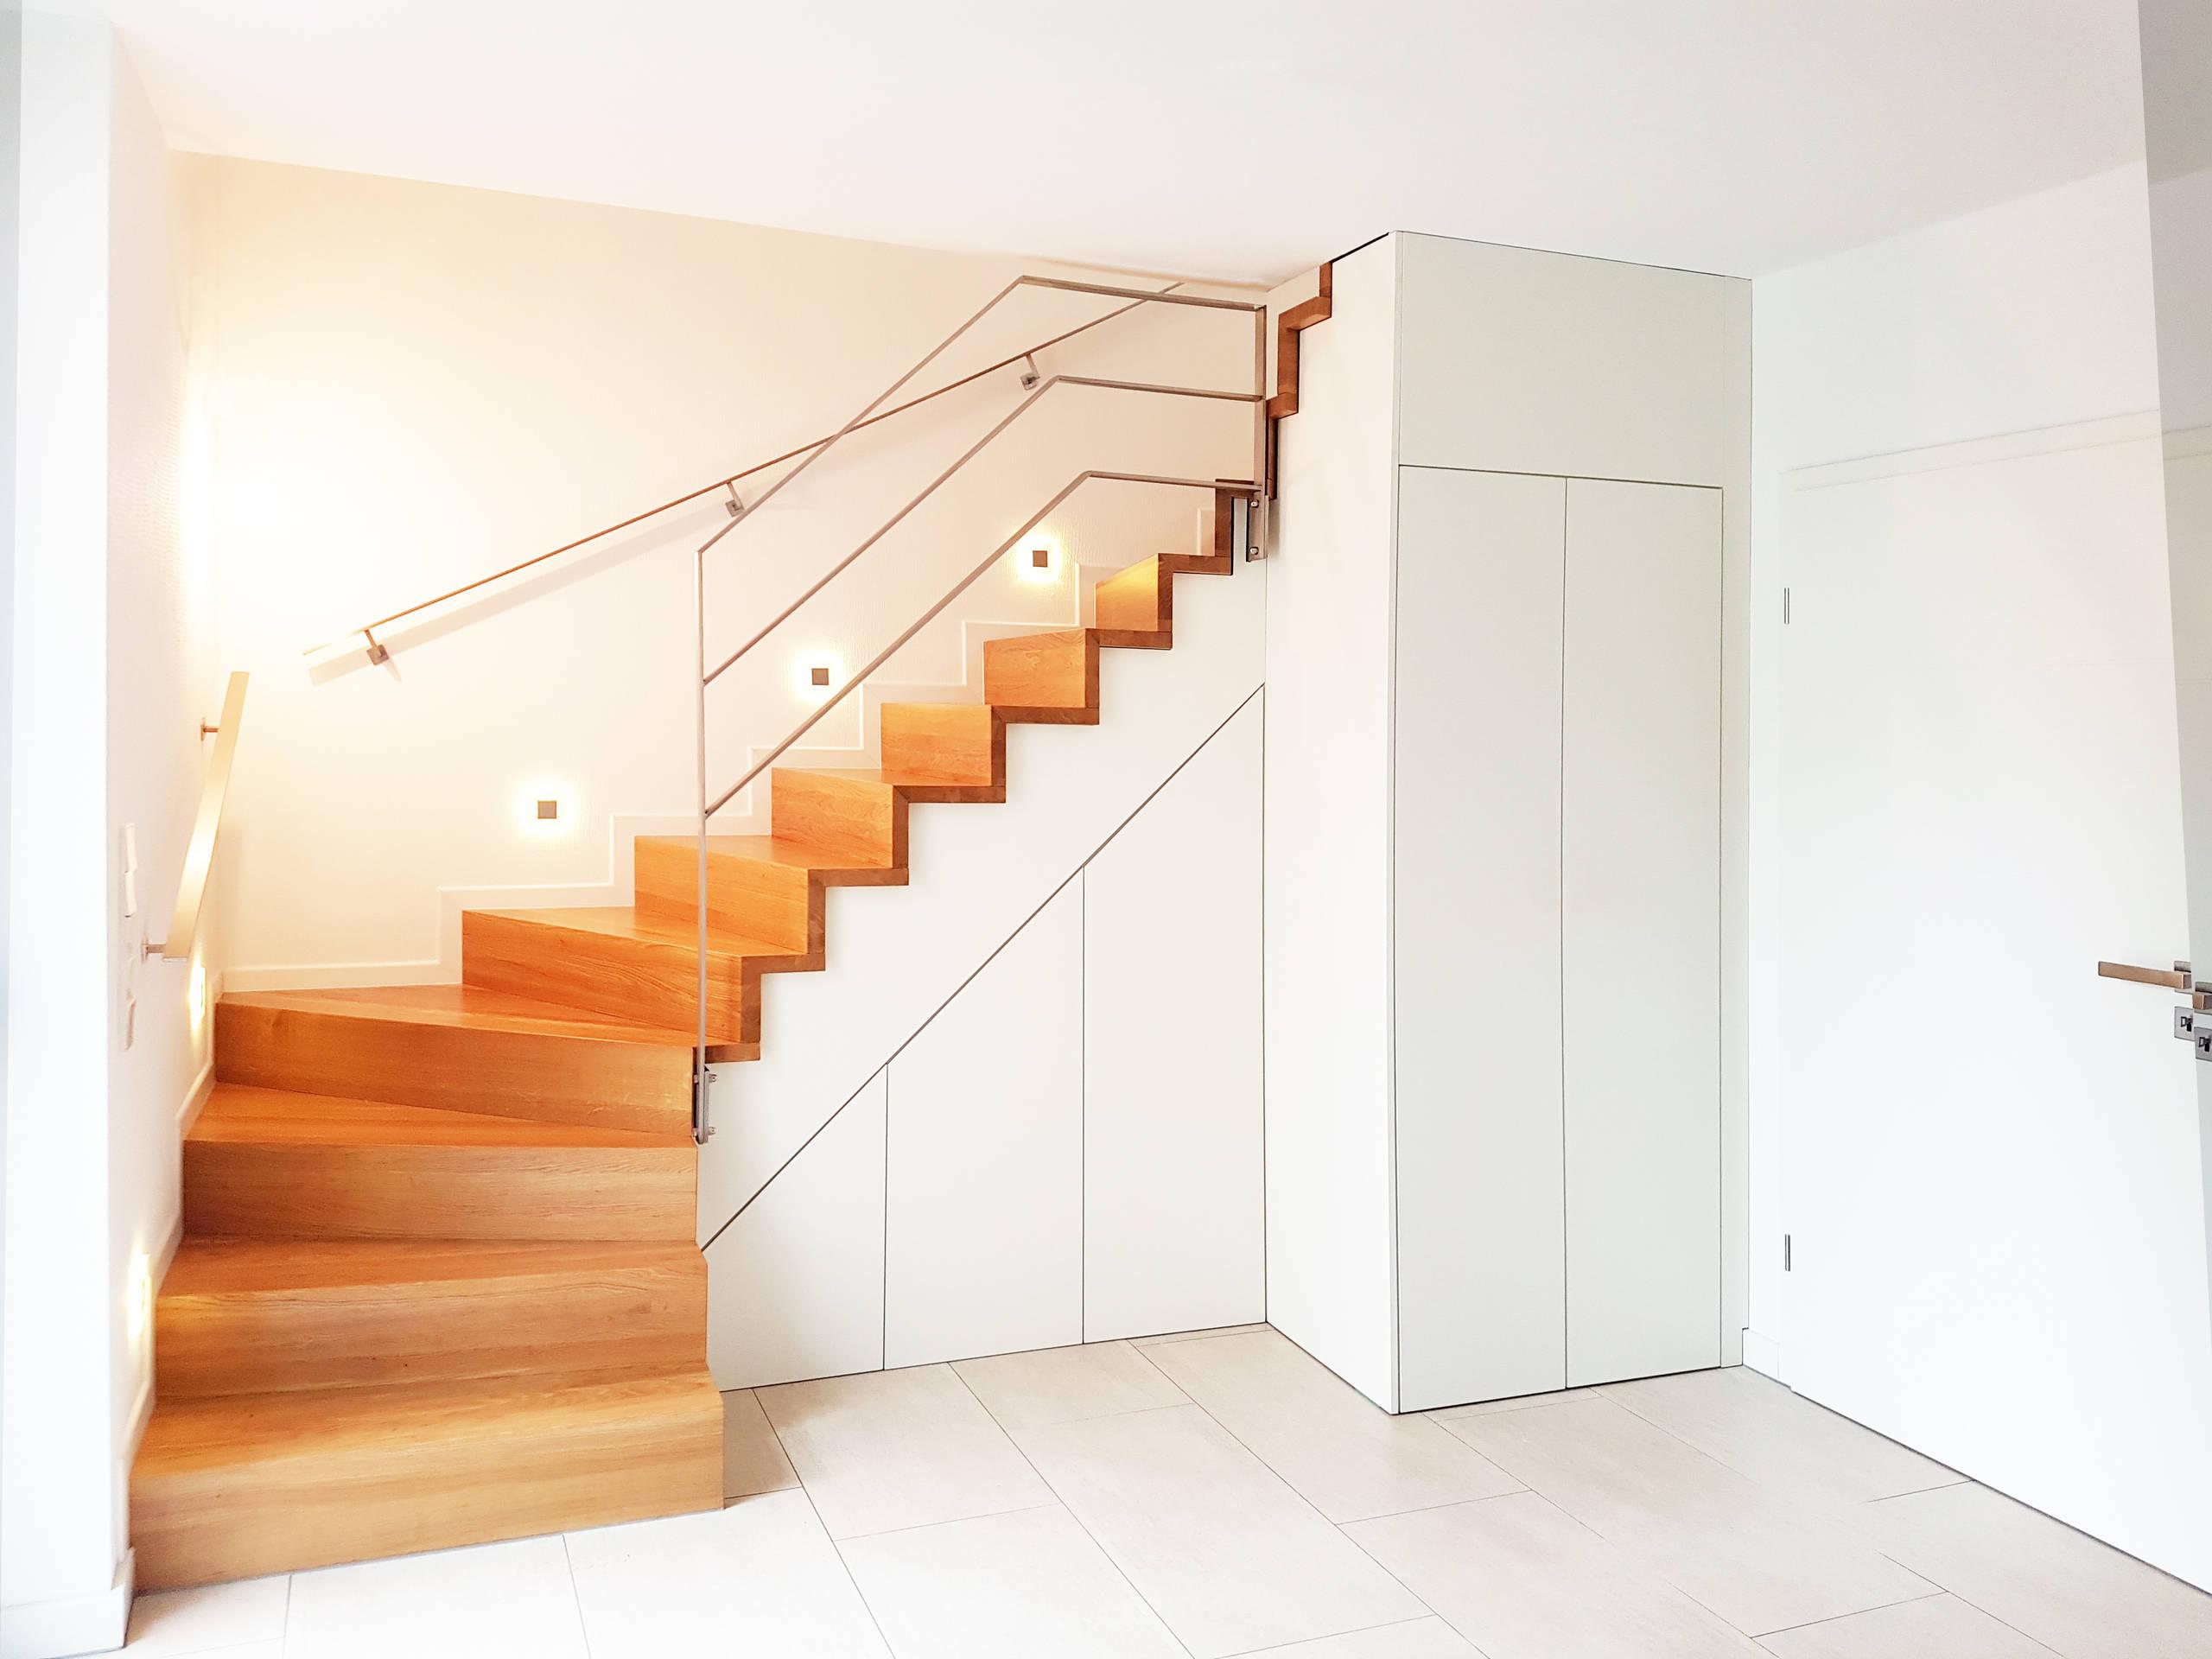 75 Beautiful Terrazzo Floor Hallway With White Walls Pictures